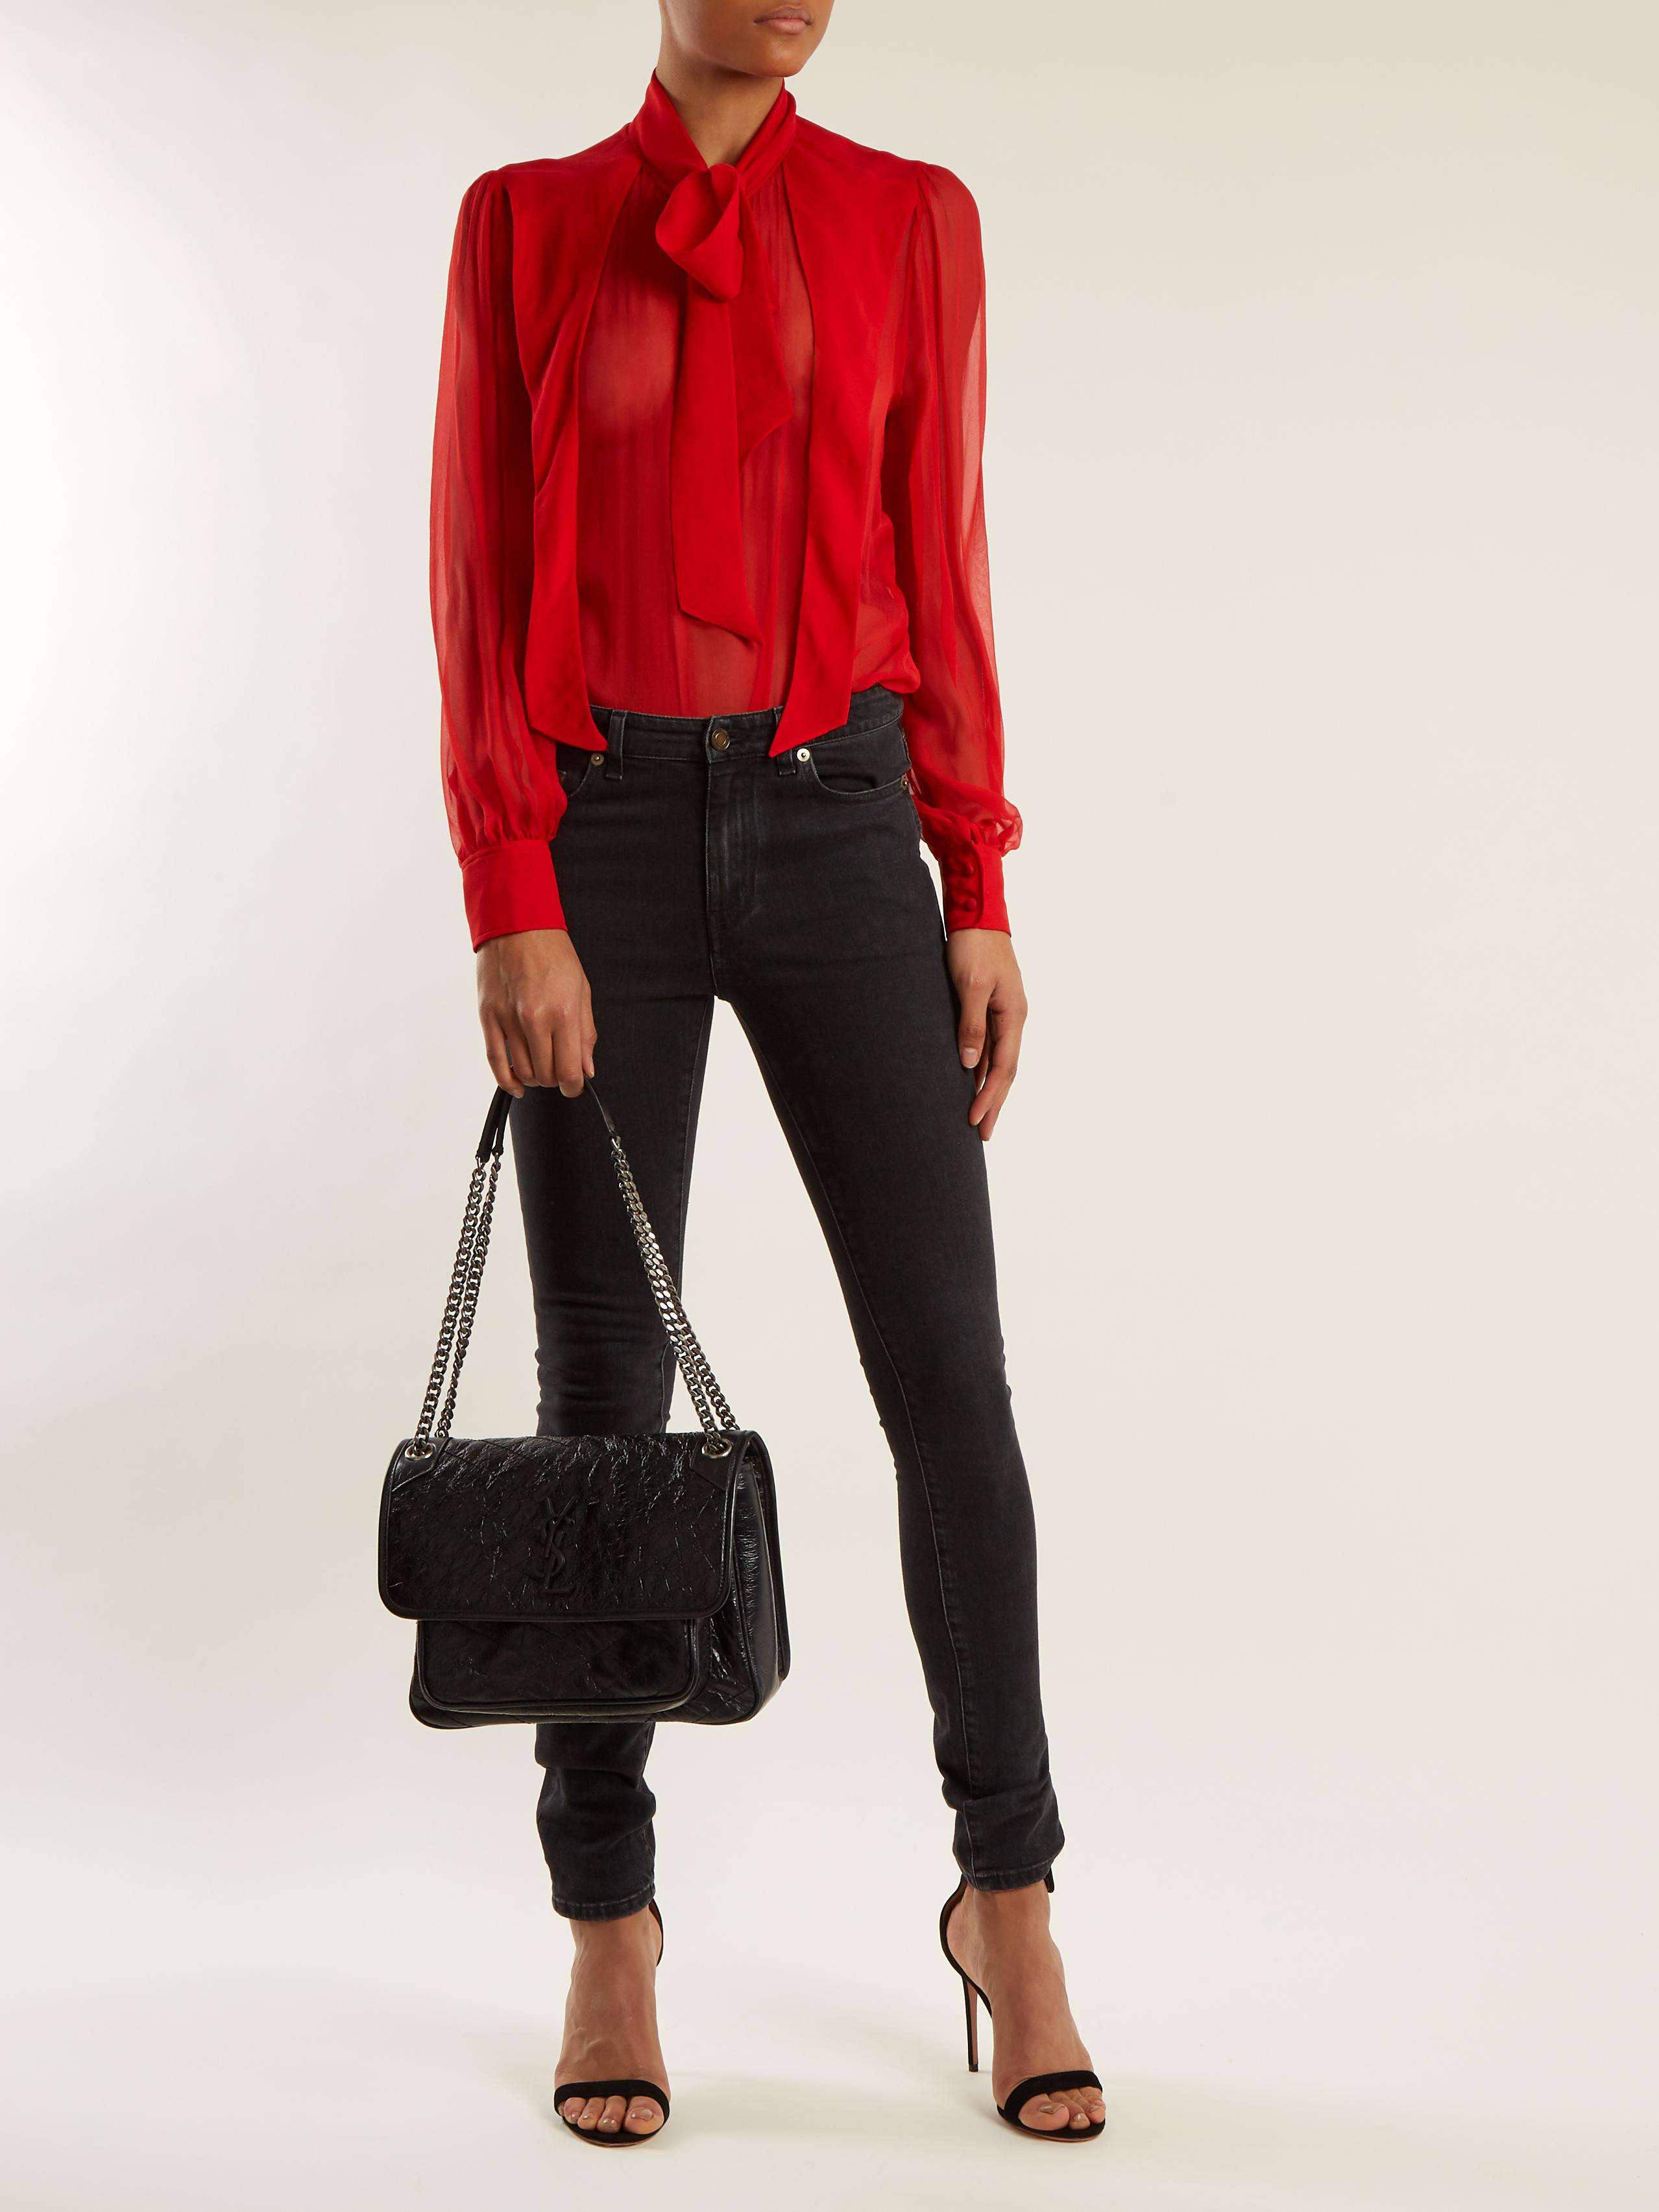 9ec07e5a1e24 ... Saint Laurent Niki Medium Quilted Leather Bag in Black - Lys low priced  dc36e 7afcb ...